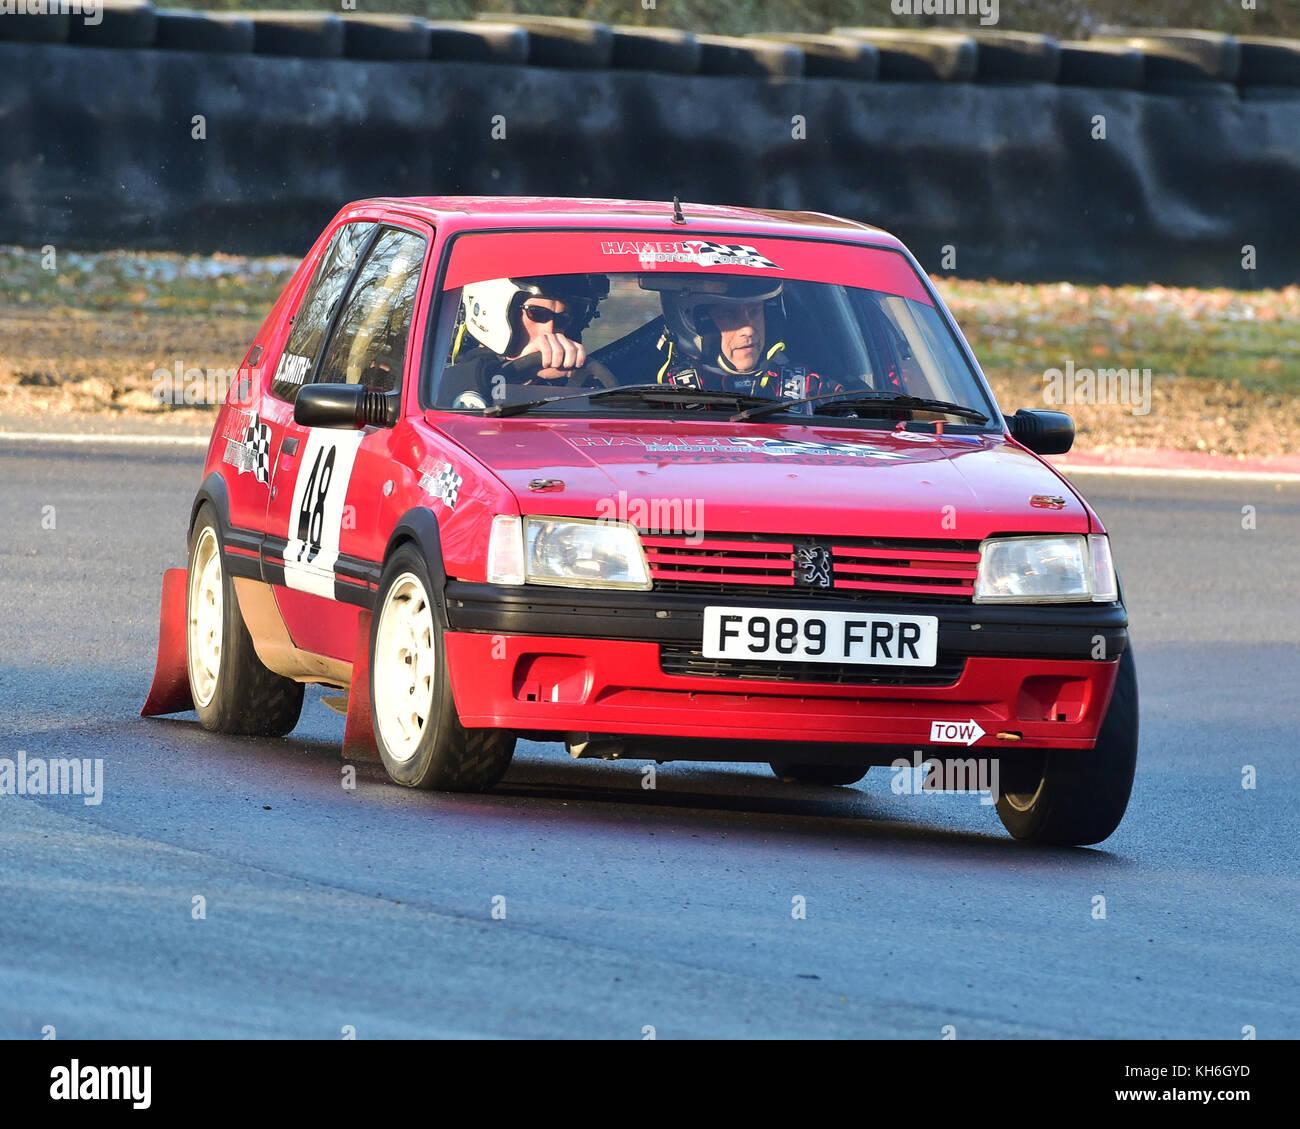 Peugeot 205 Stock Photos Amp Peugeot 205 Stock Images Alamy